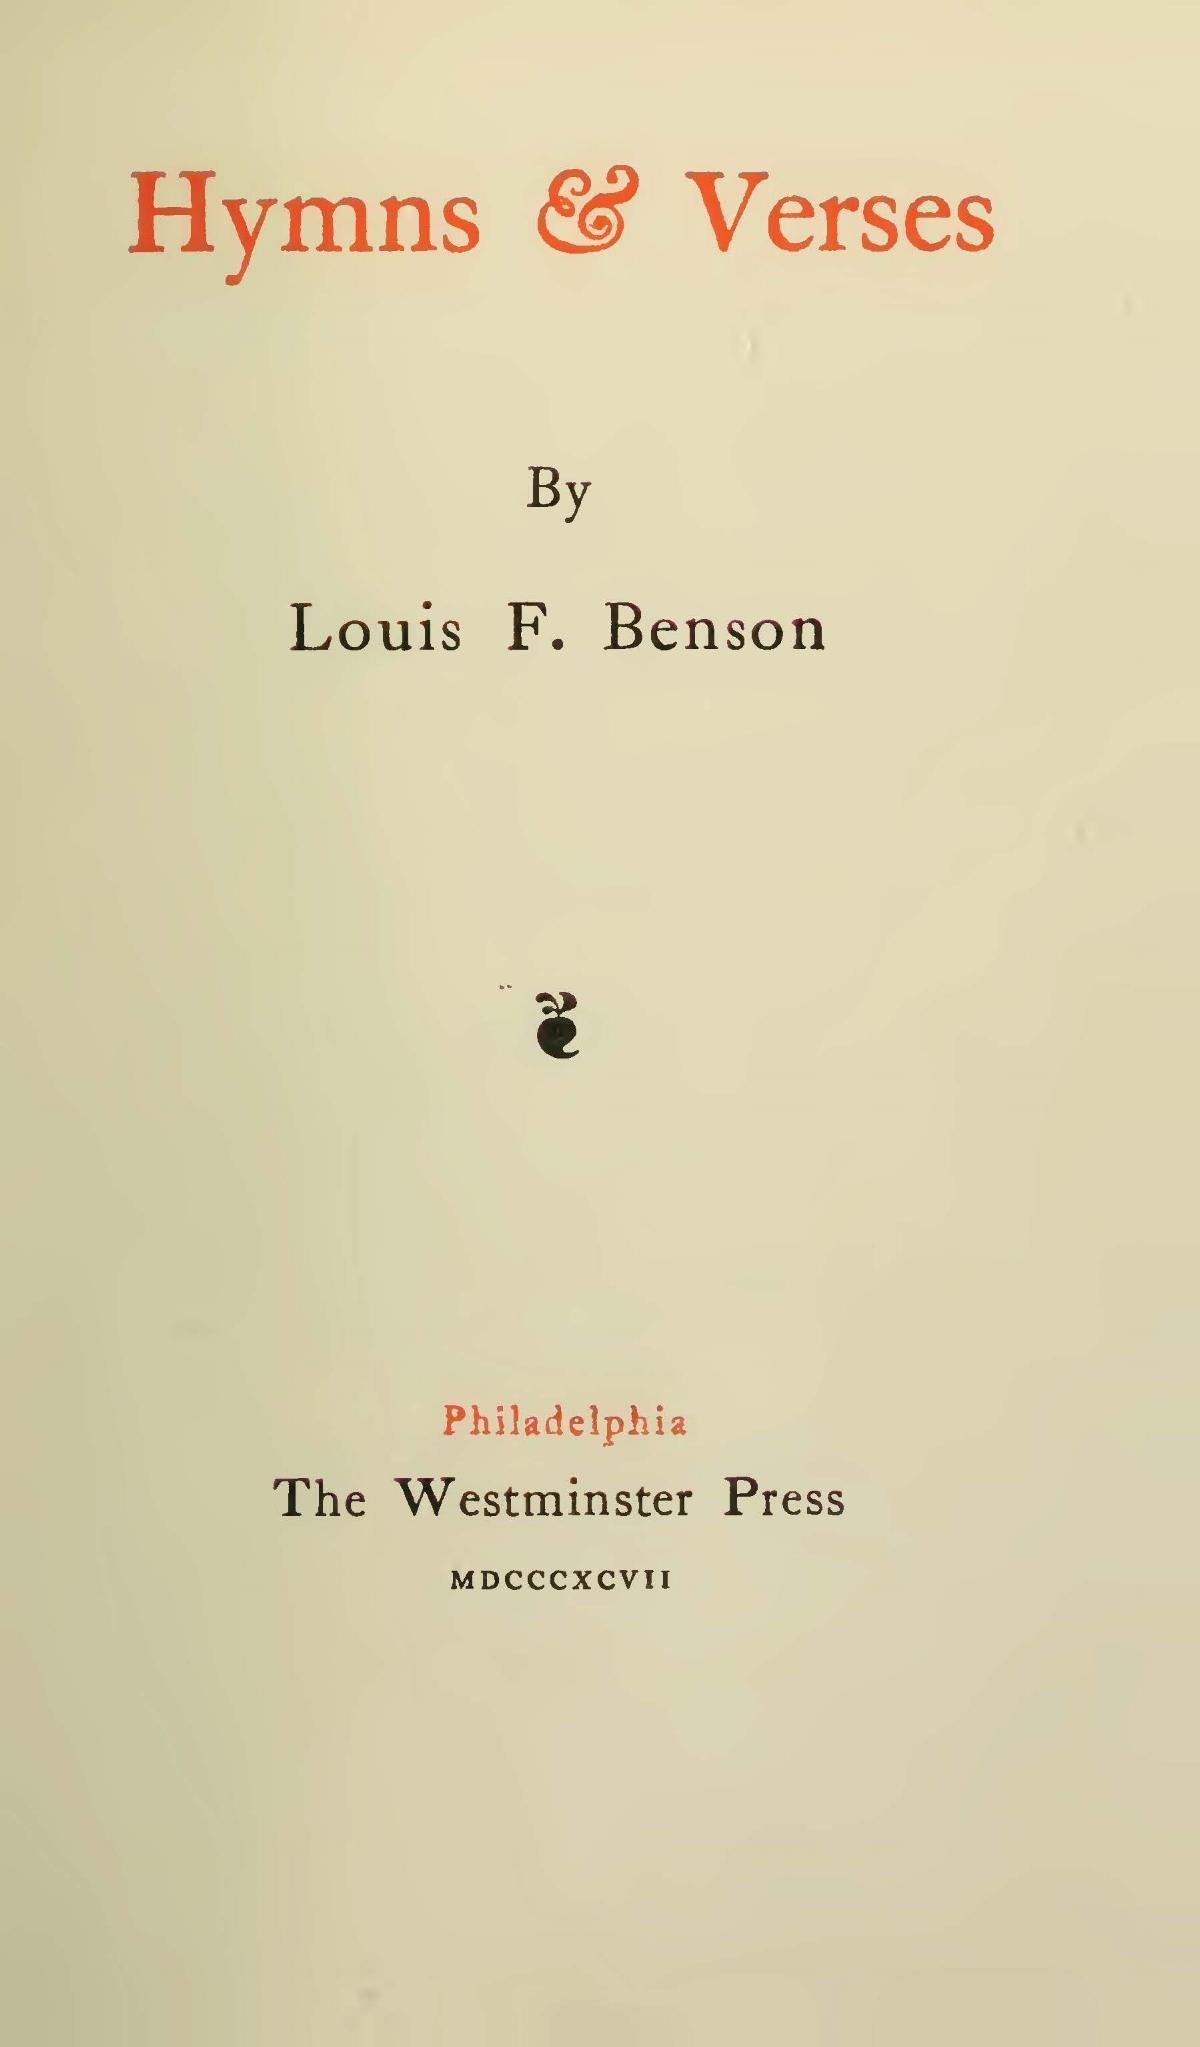 Benson, Louis FitzGerald, Hymns & Verses Title Page.jpg